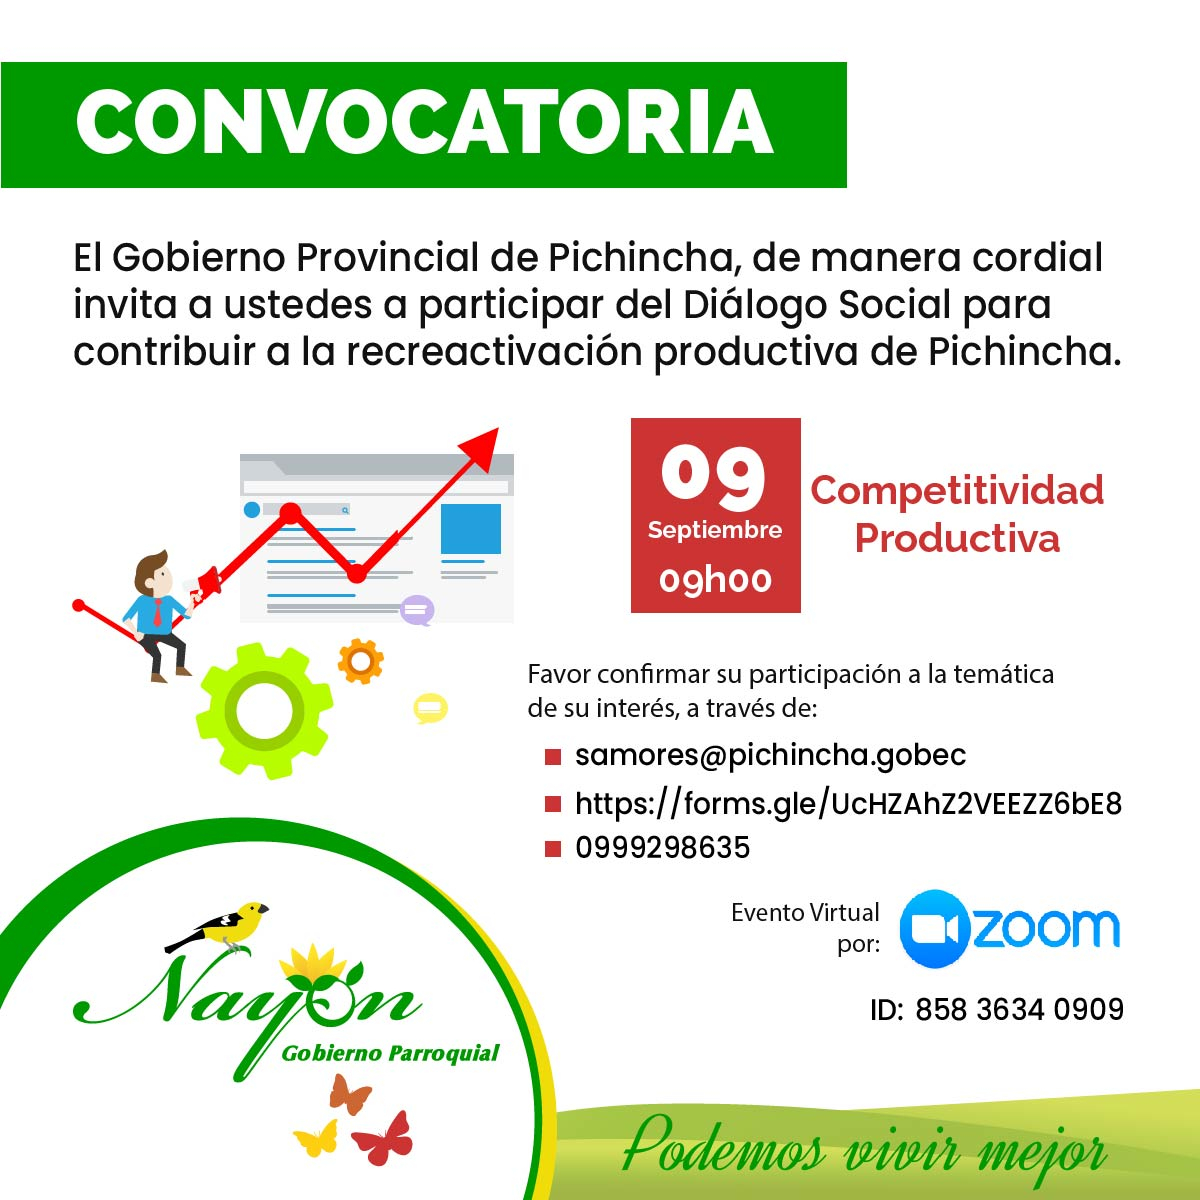 Convocatoria Competitividad Productiva